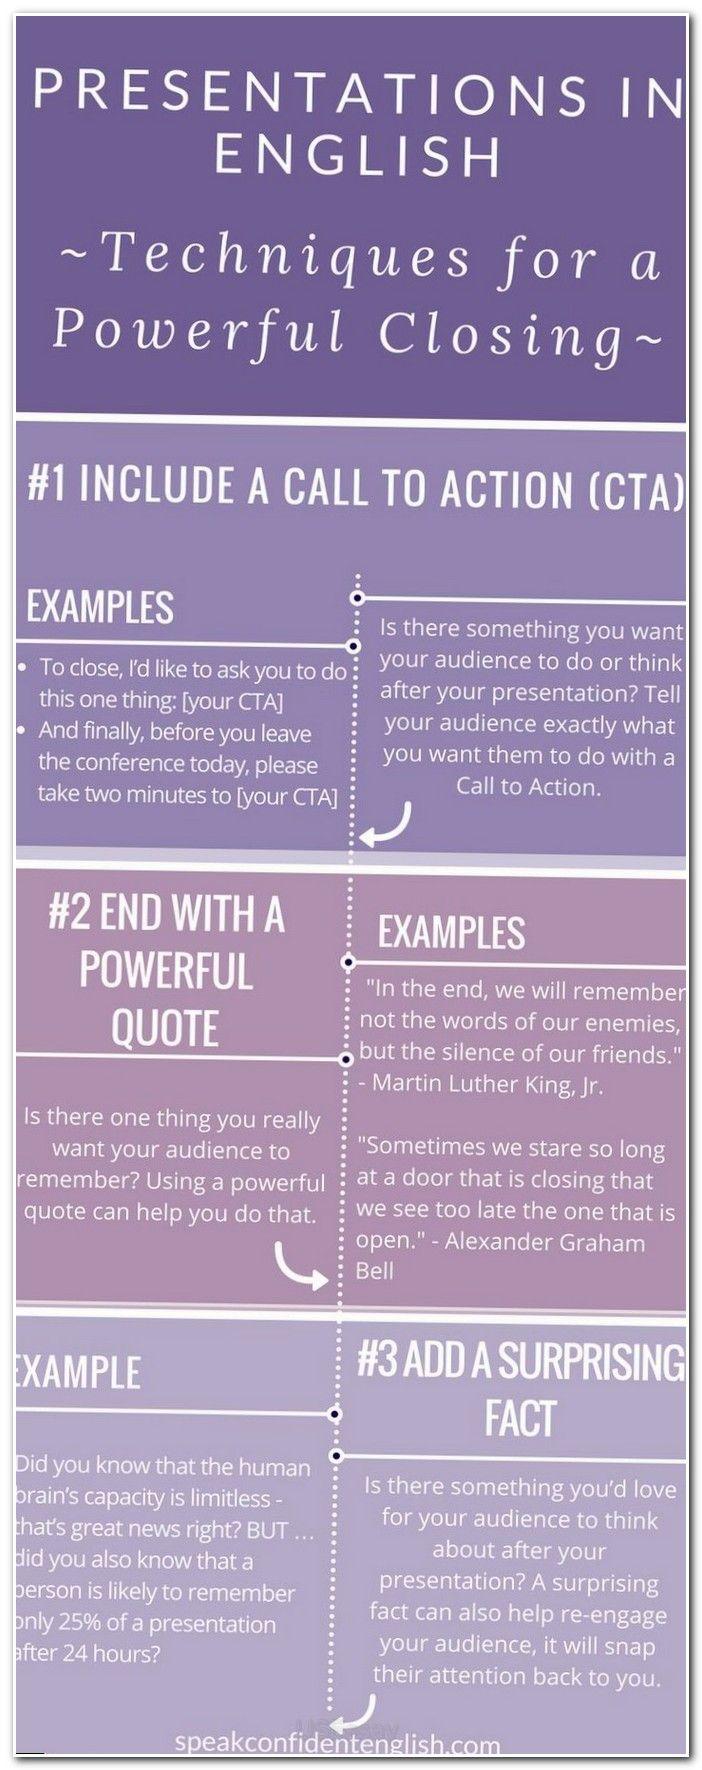 essay essaytips apa format outline best creative writing topics essay essaytips apa format outline best creative writing topics essay topics for argumentative